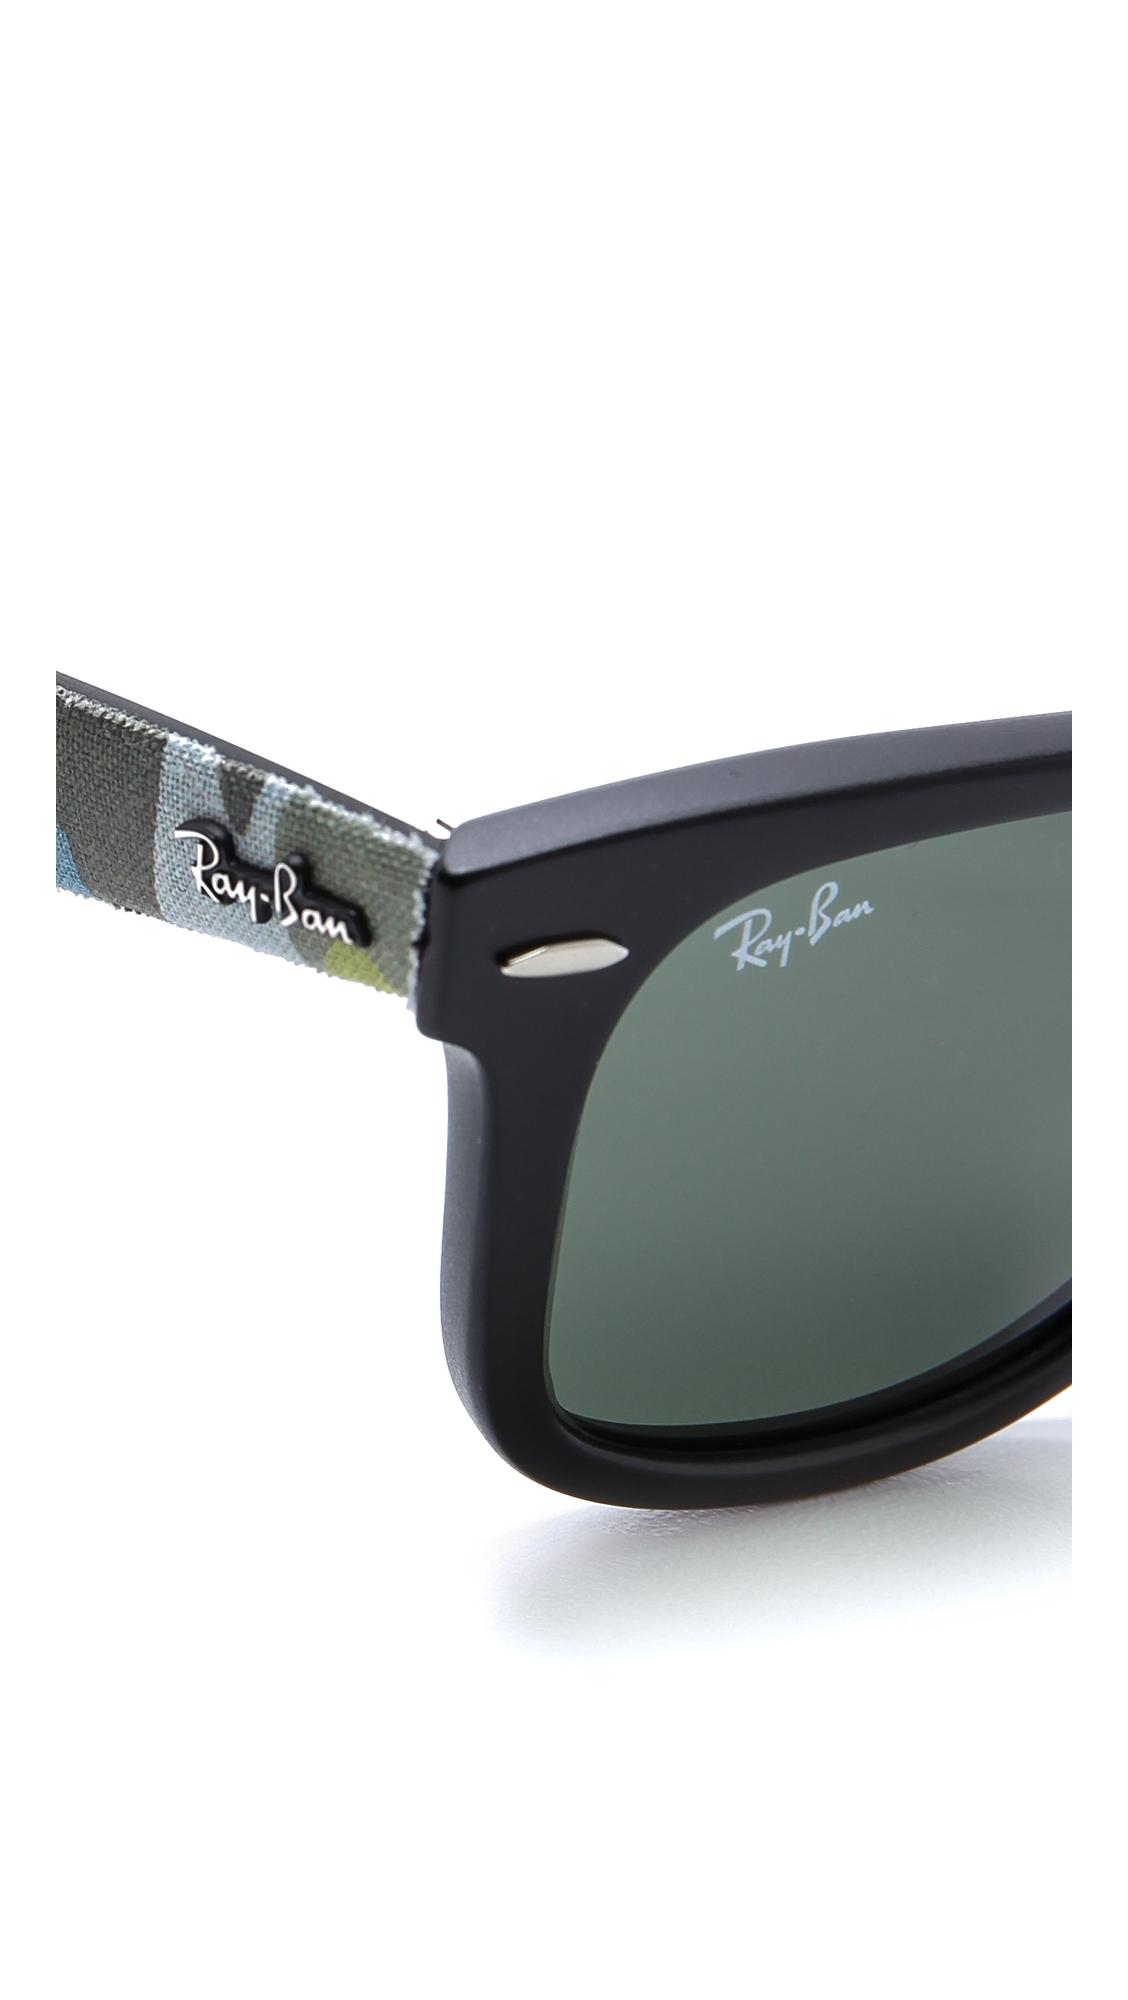 750410f872 Ray-Ban Camouflage Wayfarer Sunglasses